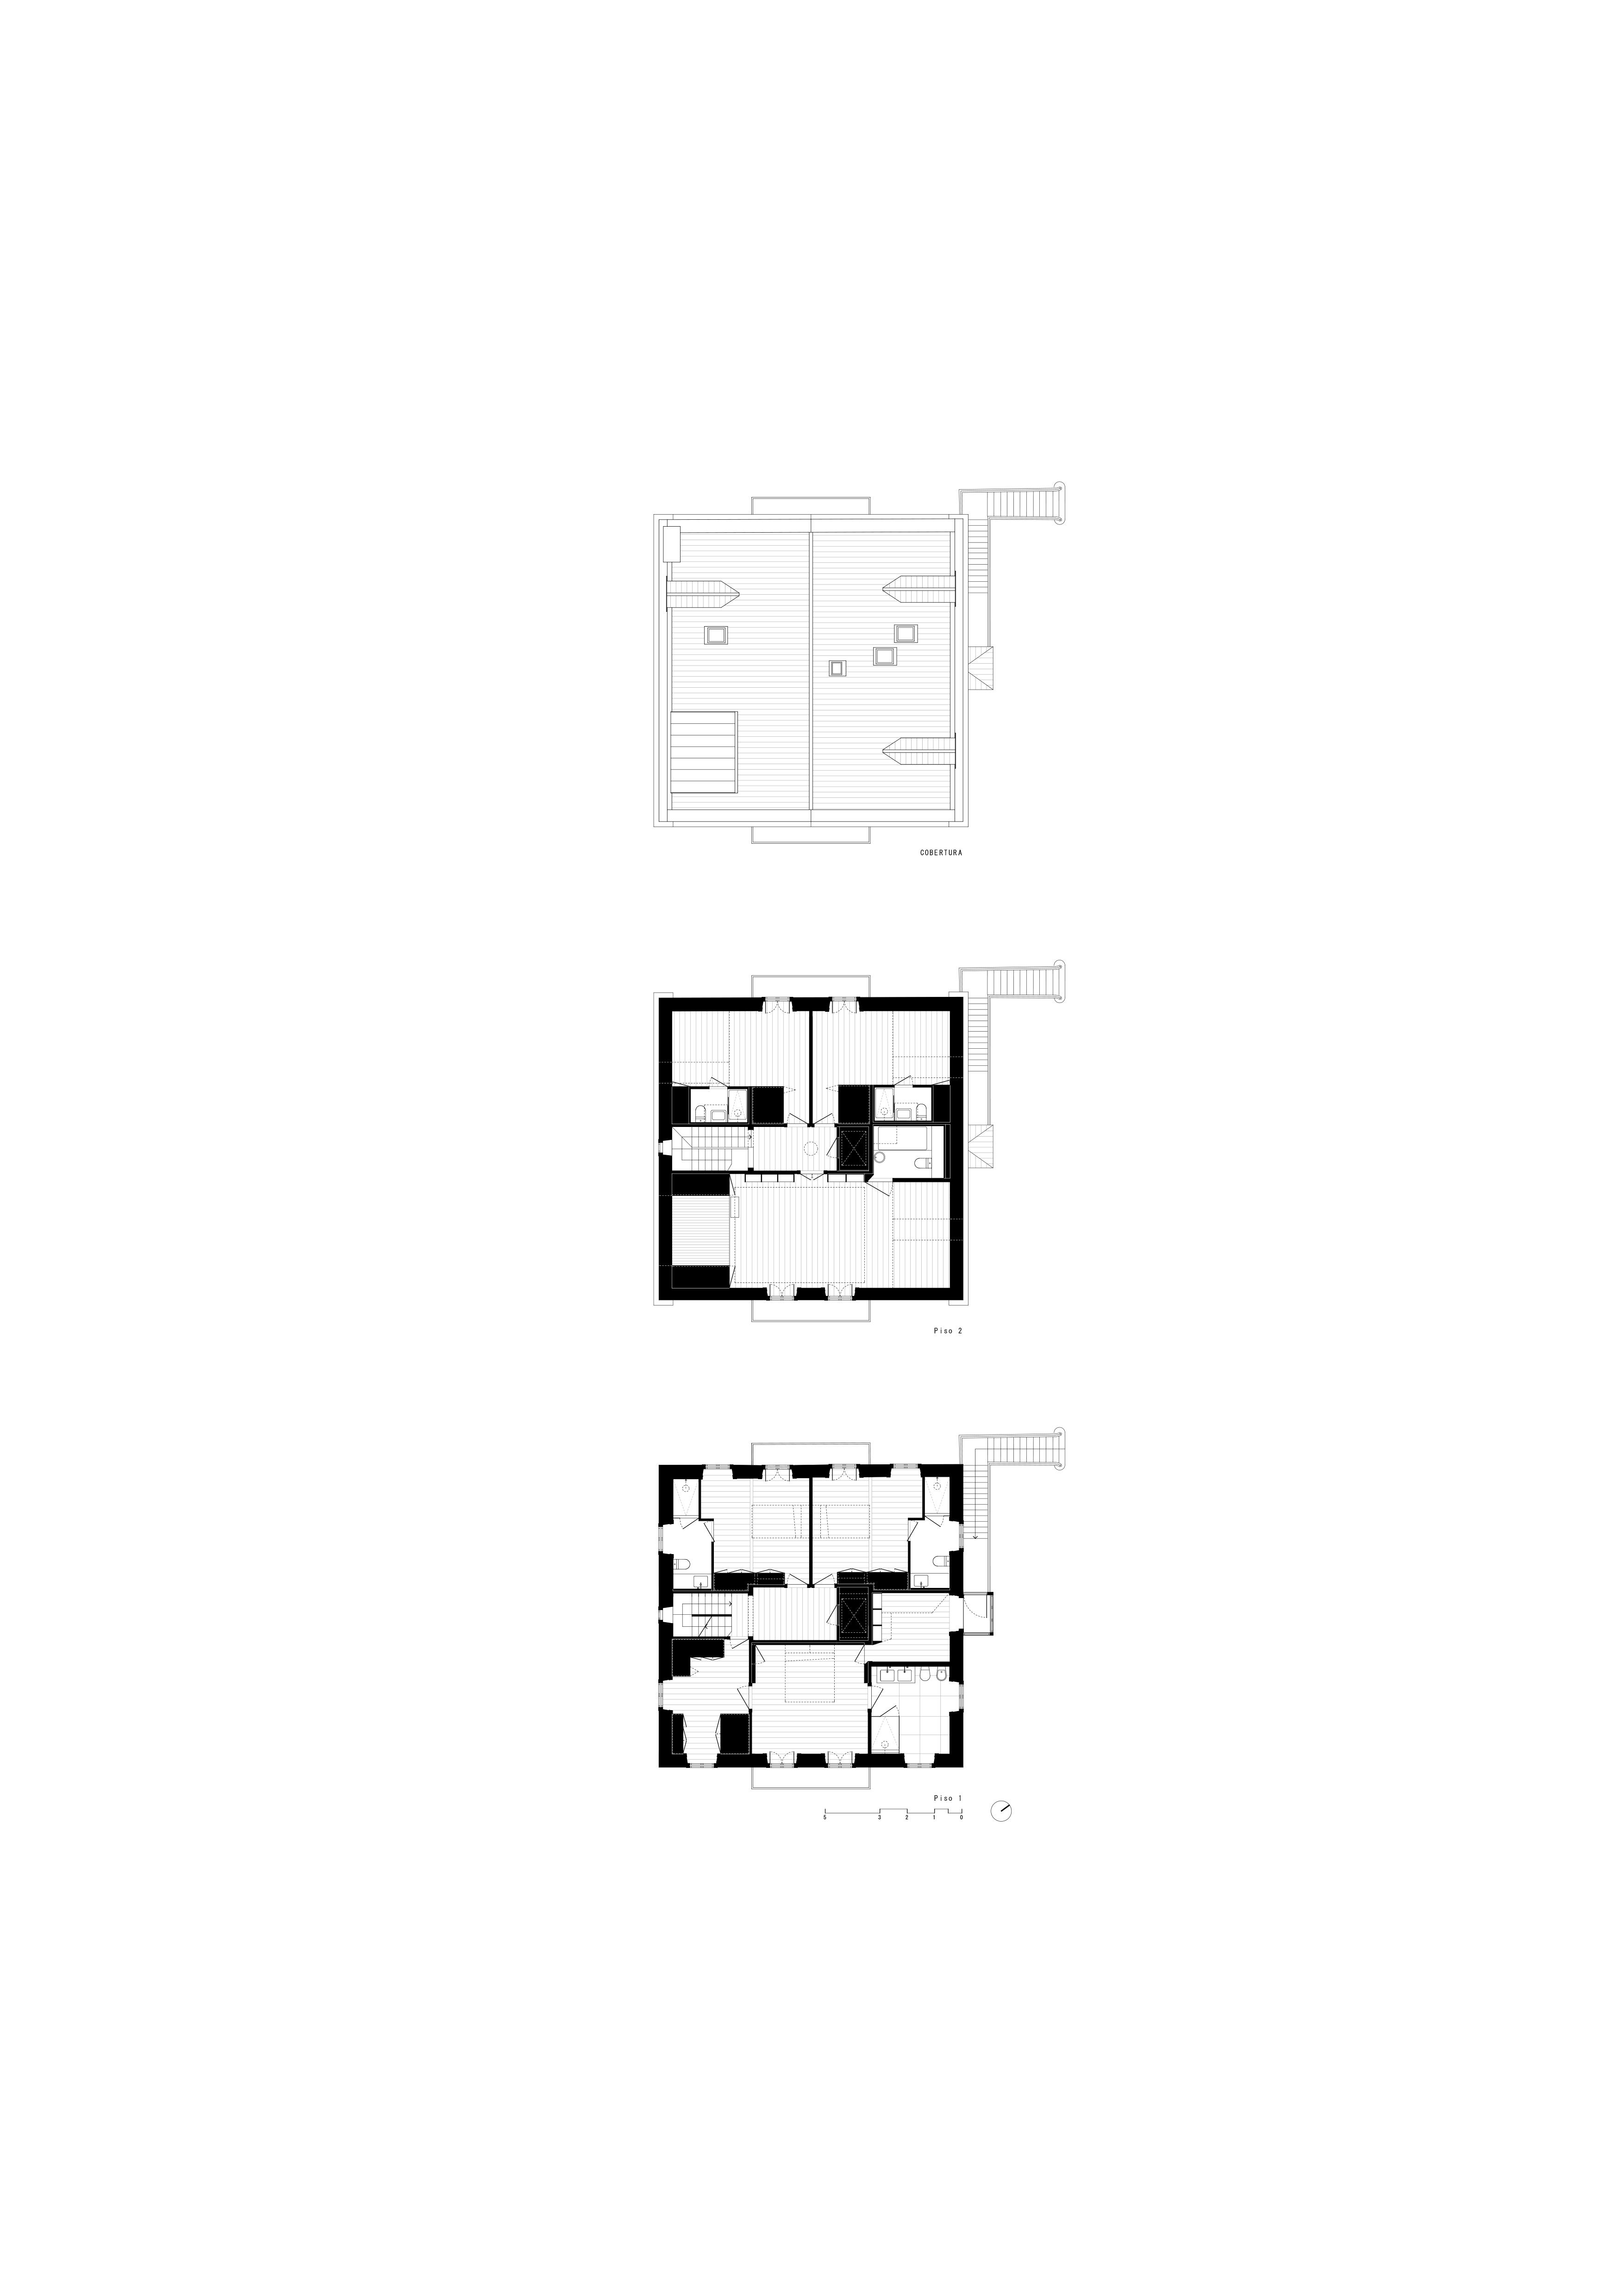 03 ARCHDAILY_Casa Alexius_Piso 1_2_Cobertura